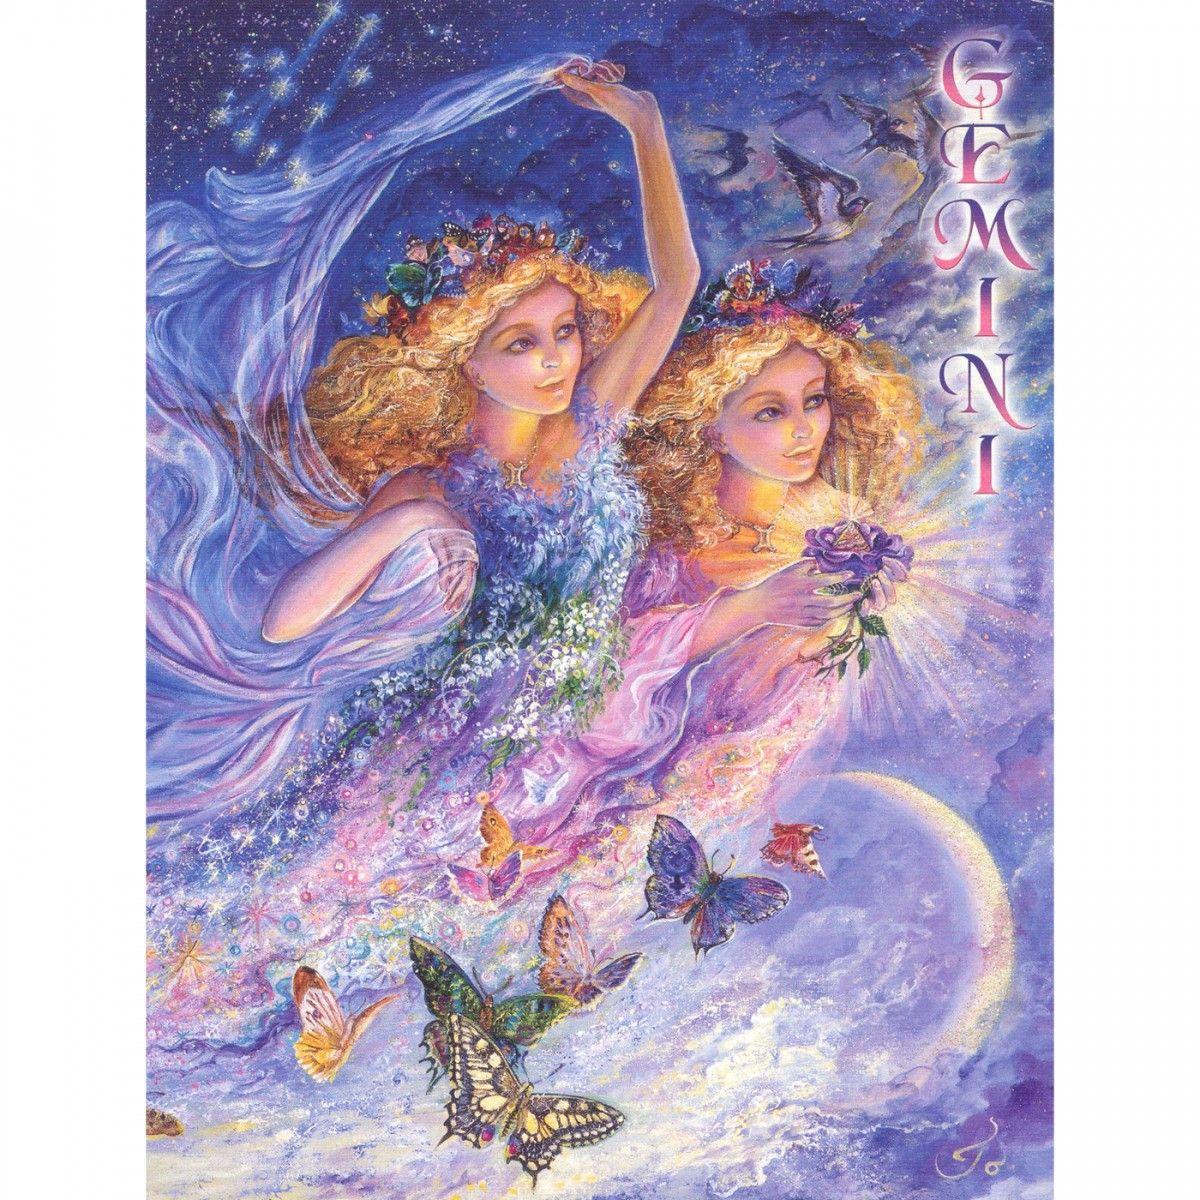 GEMINI Josephine Wall Zodiac Fantasy Art Poster New